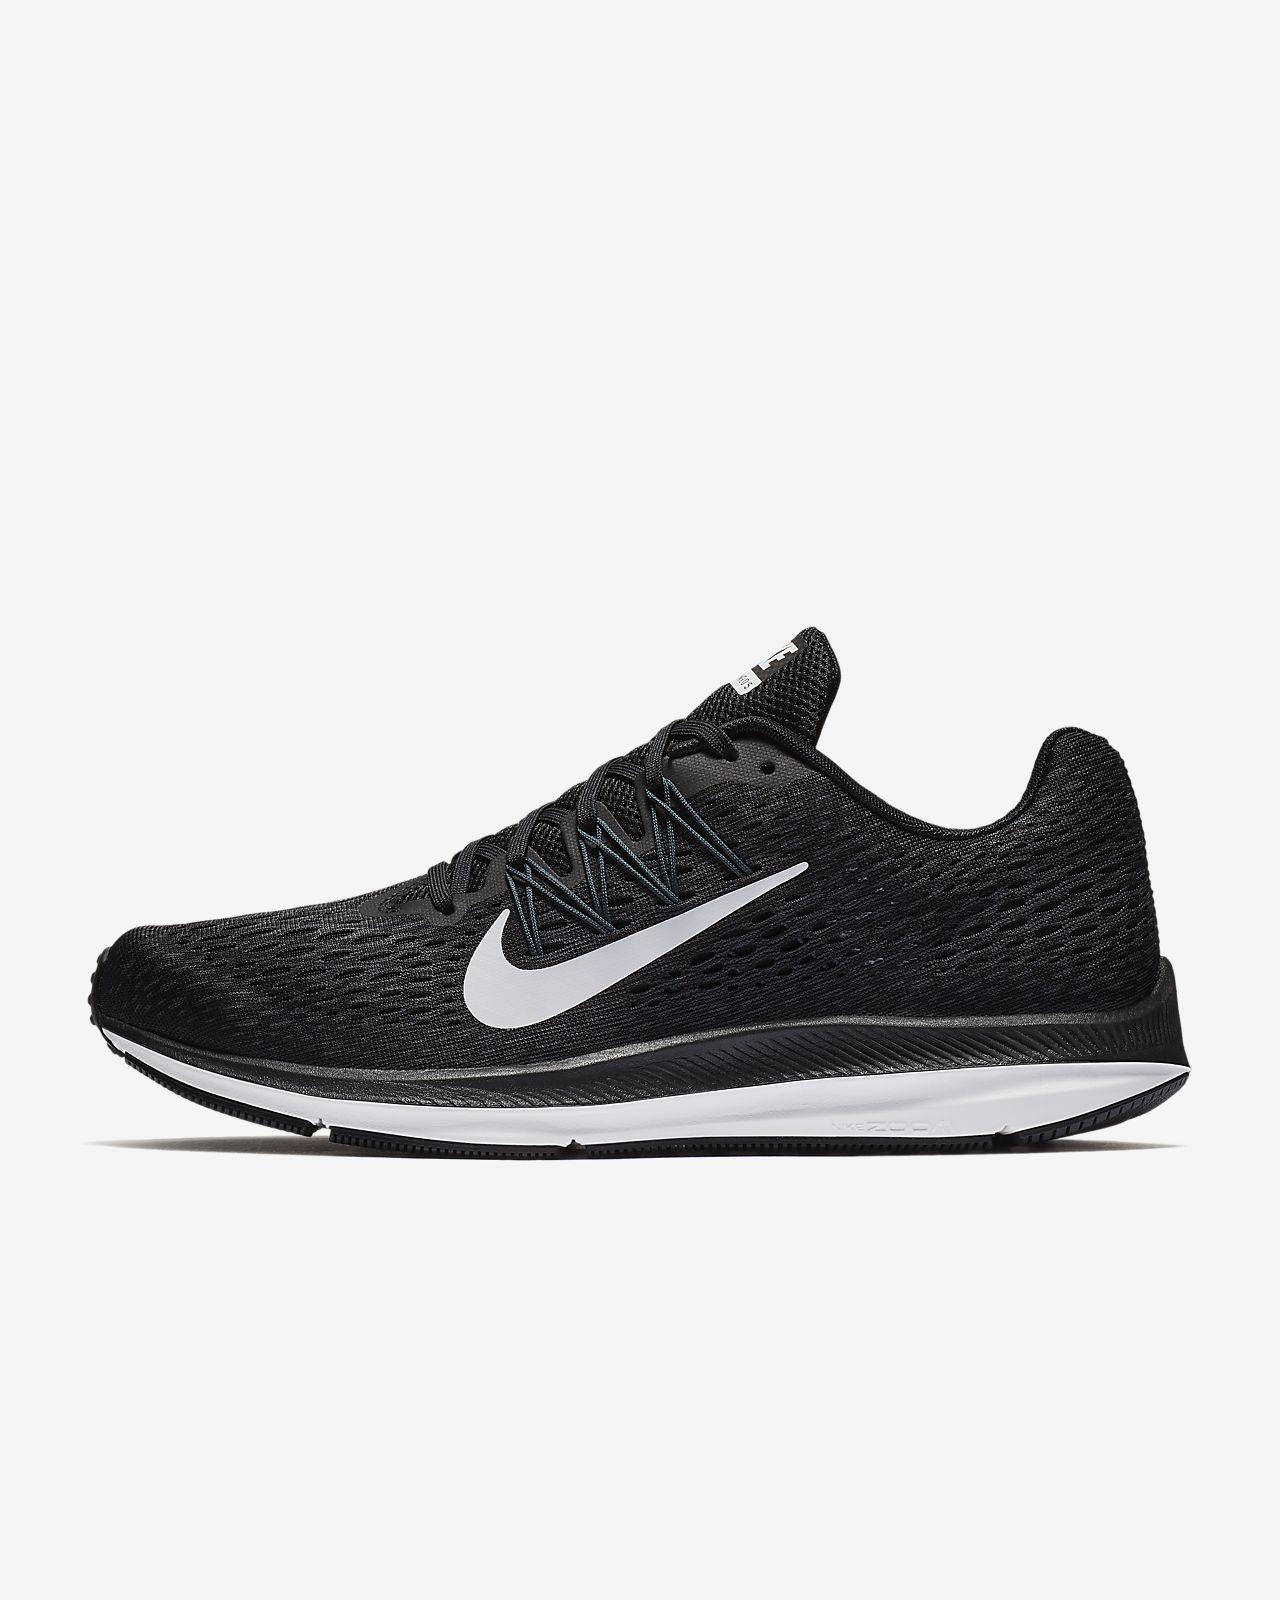 Zoom 5 running de Homme pour Winflo CH Chaussure Nike Air q1UIvn